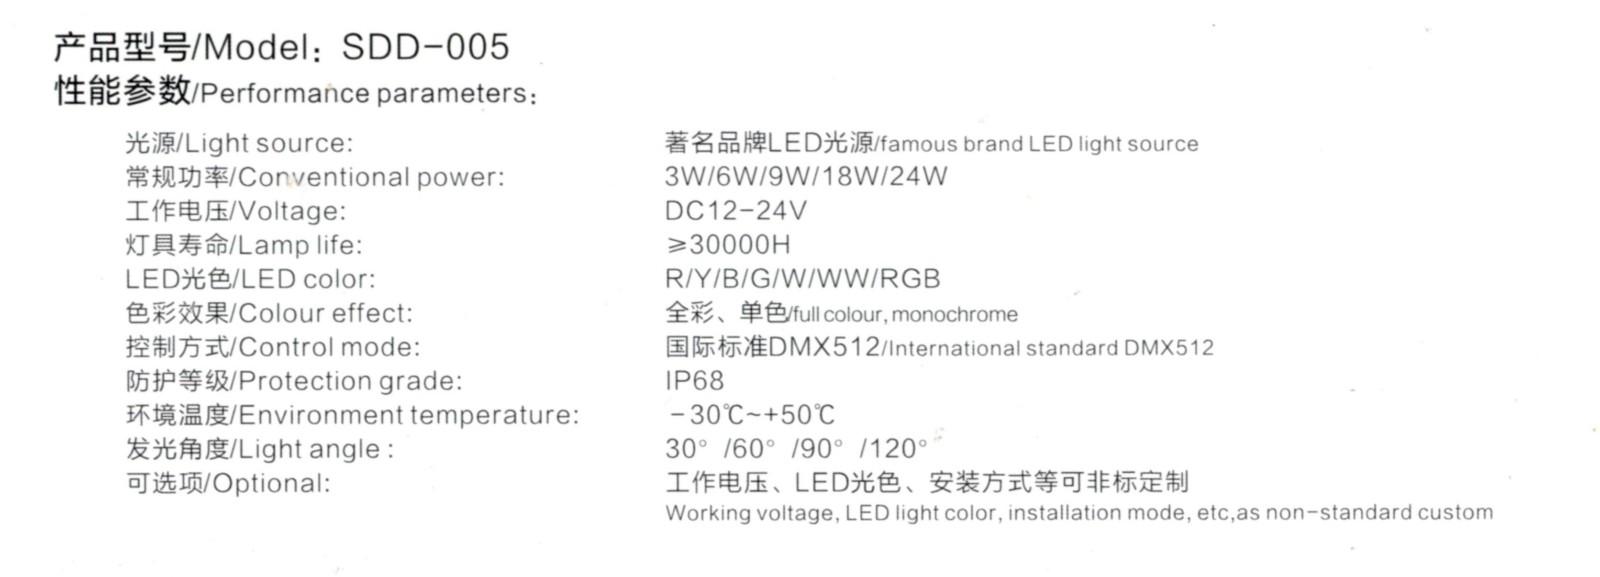 LED水底灯Model∶SDD-005参数.jpg